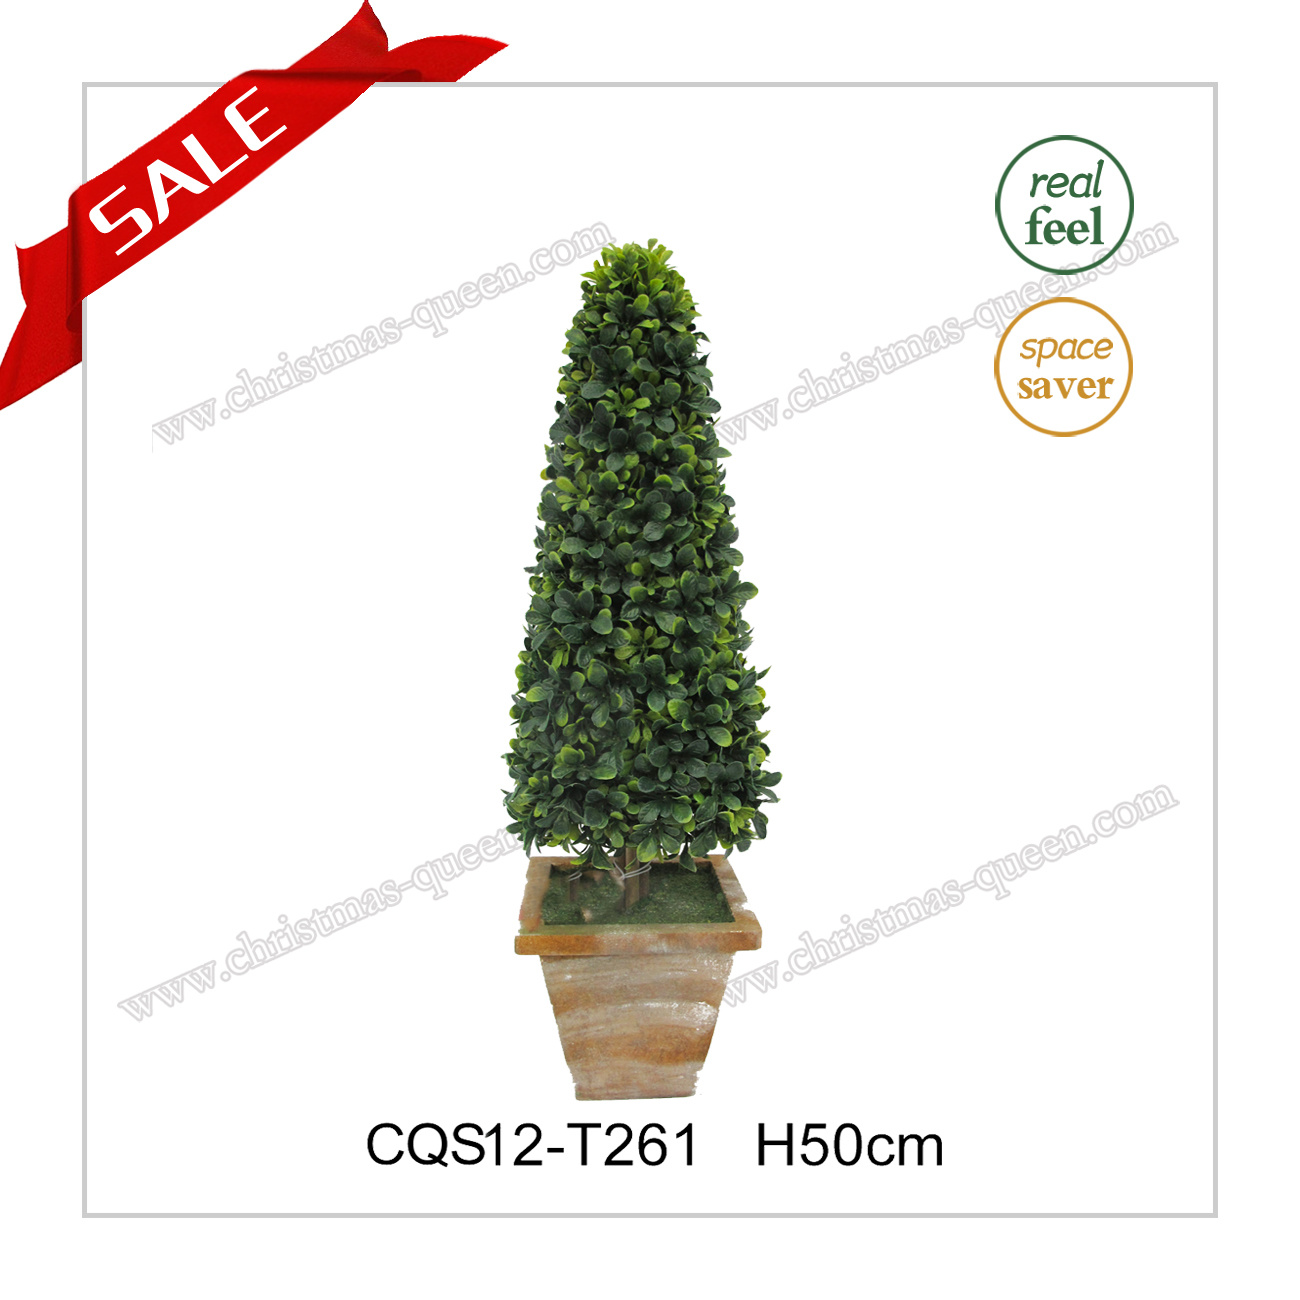 H47cm Home Artificial Indoor Potted Plants Bonsai Artificial Plant